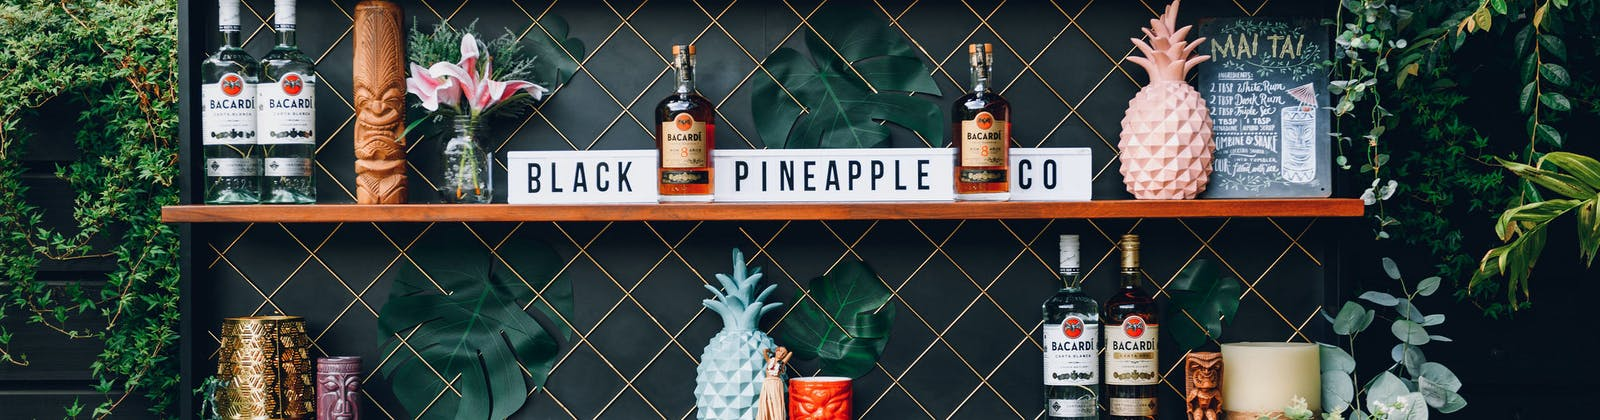 black pineapple co elemental auckland